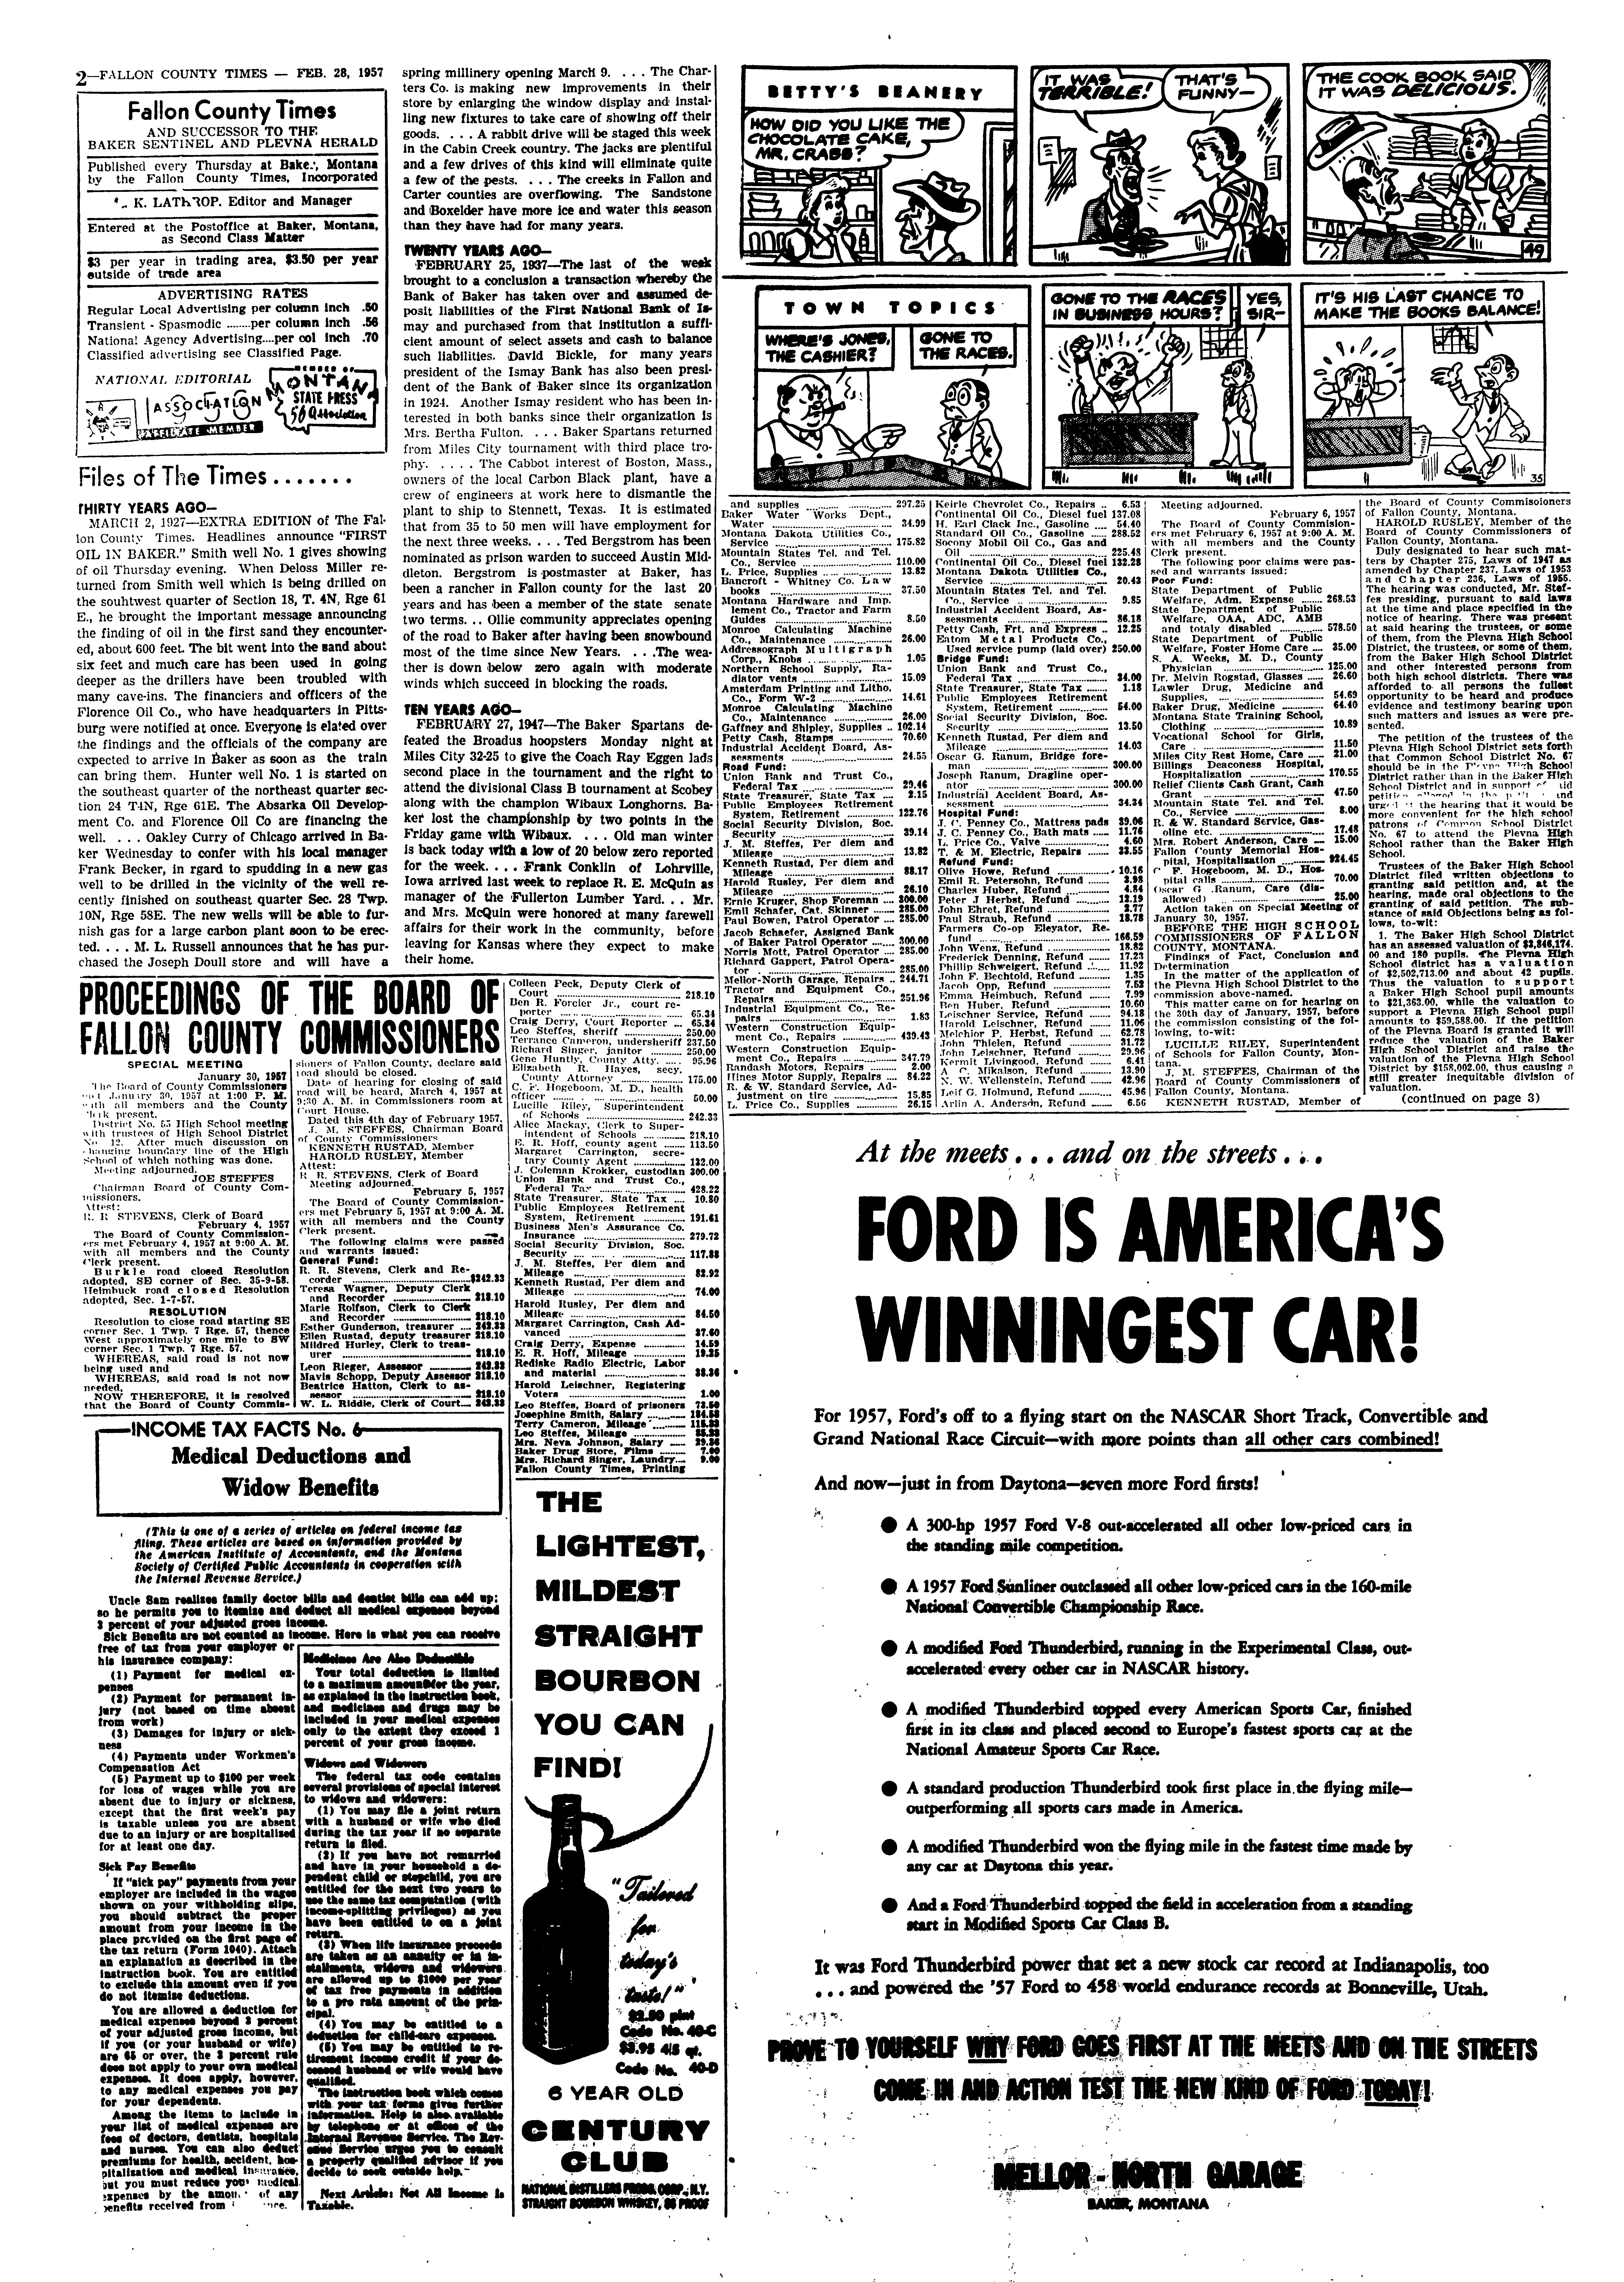 Fallon County Times, February 28, 1957, Page 2, Image 2